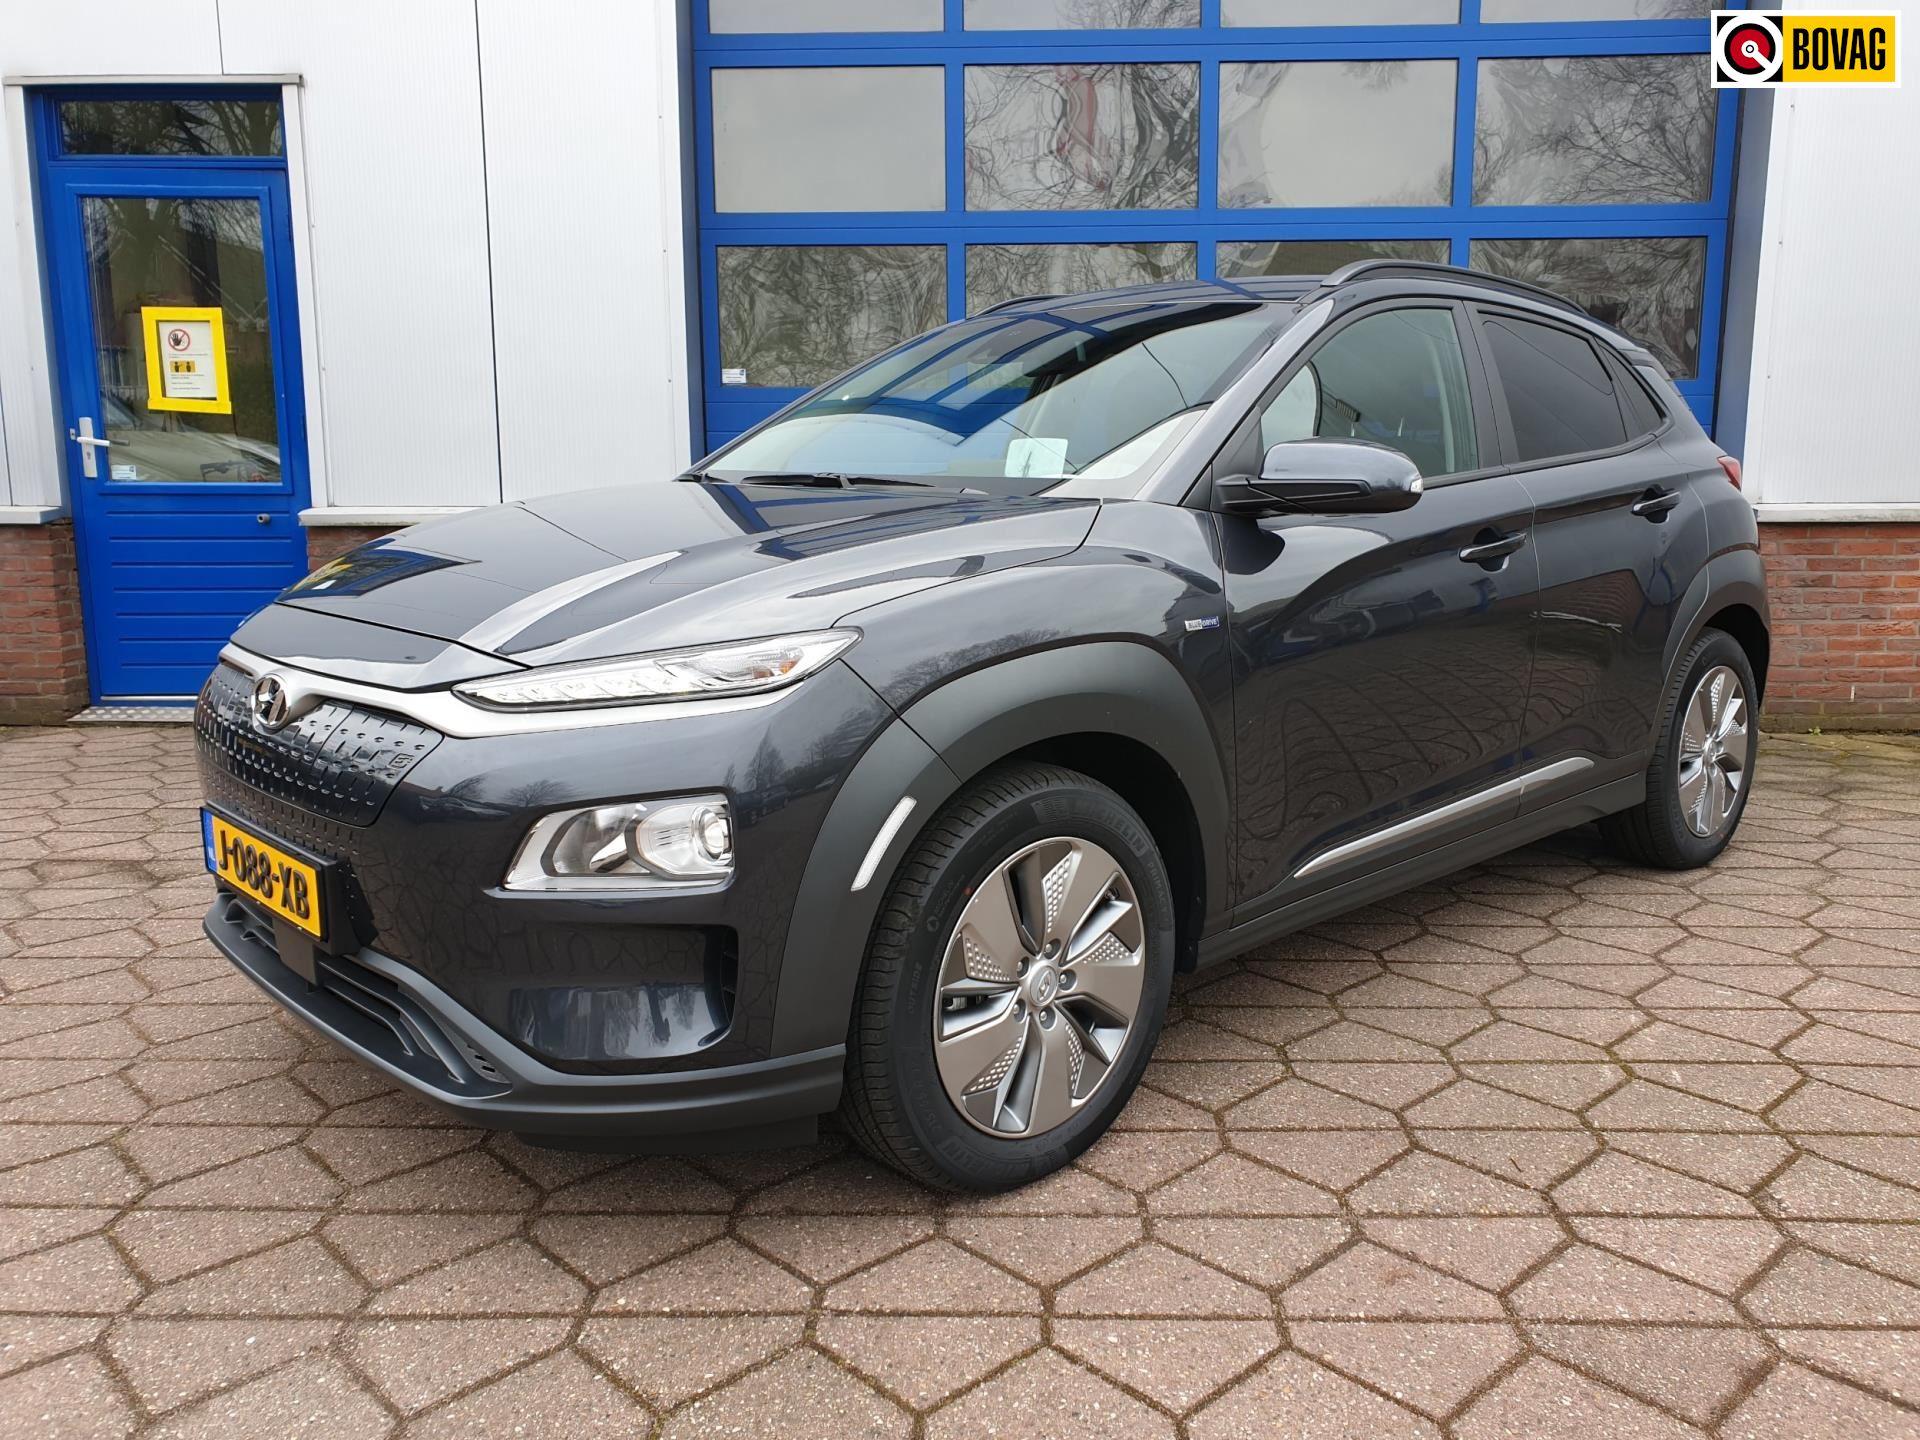 Hyundai Kona occasion - Autobedrijf  Maathuis Hengelo